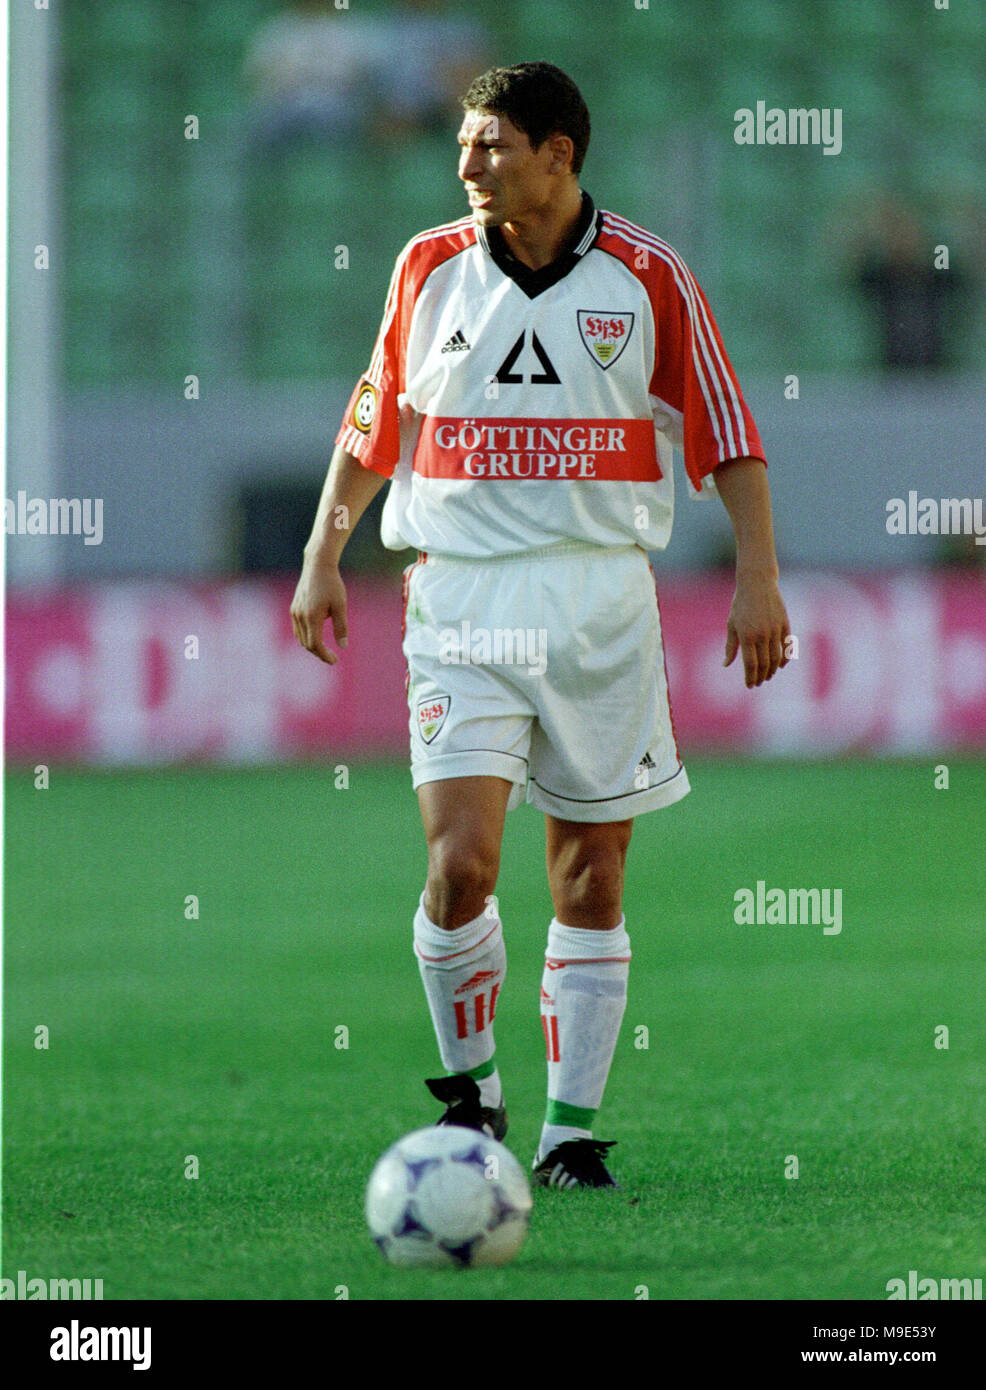 BayArena Leverkusen, Germany, 8.8.1998, German Liga-Cup Final, FC Bayern Munich vs VfB Stuttgart --- Krassimir BALAKOV (Stuttgart) - Stock Image